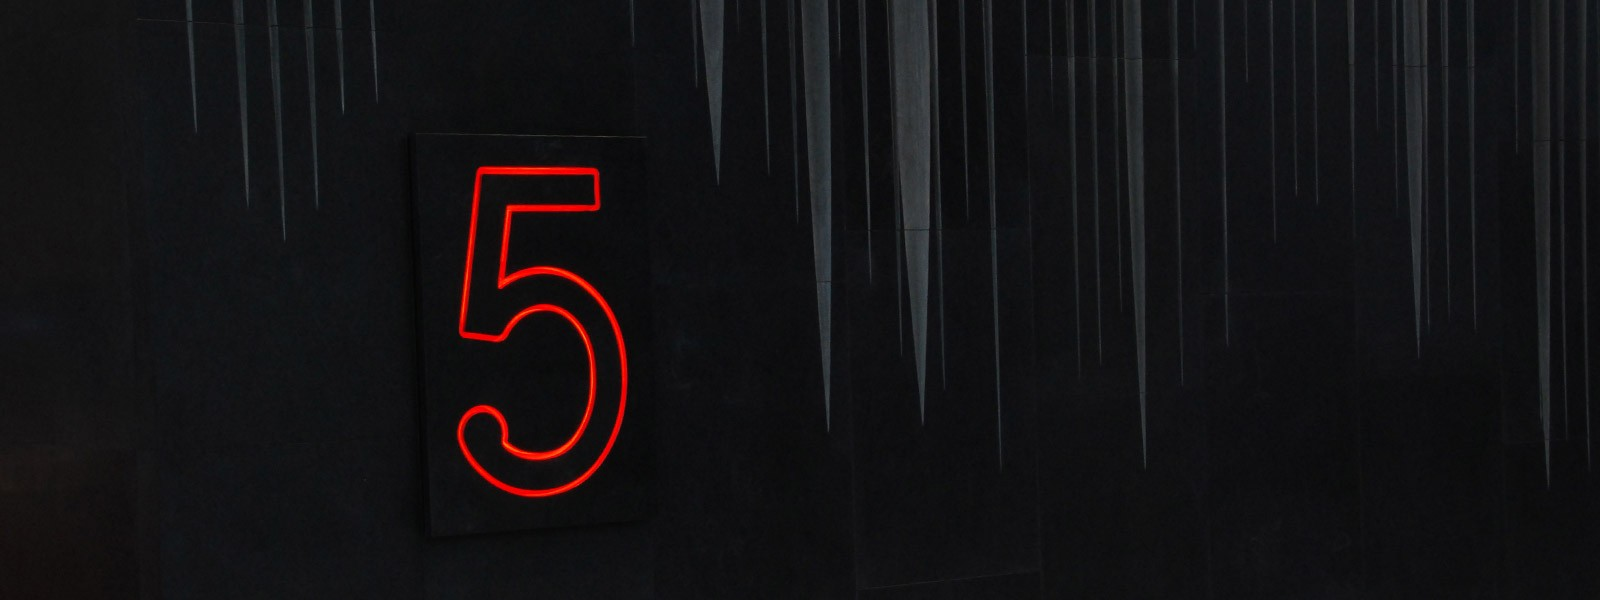 5, Merchant Square